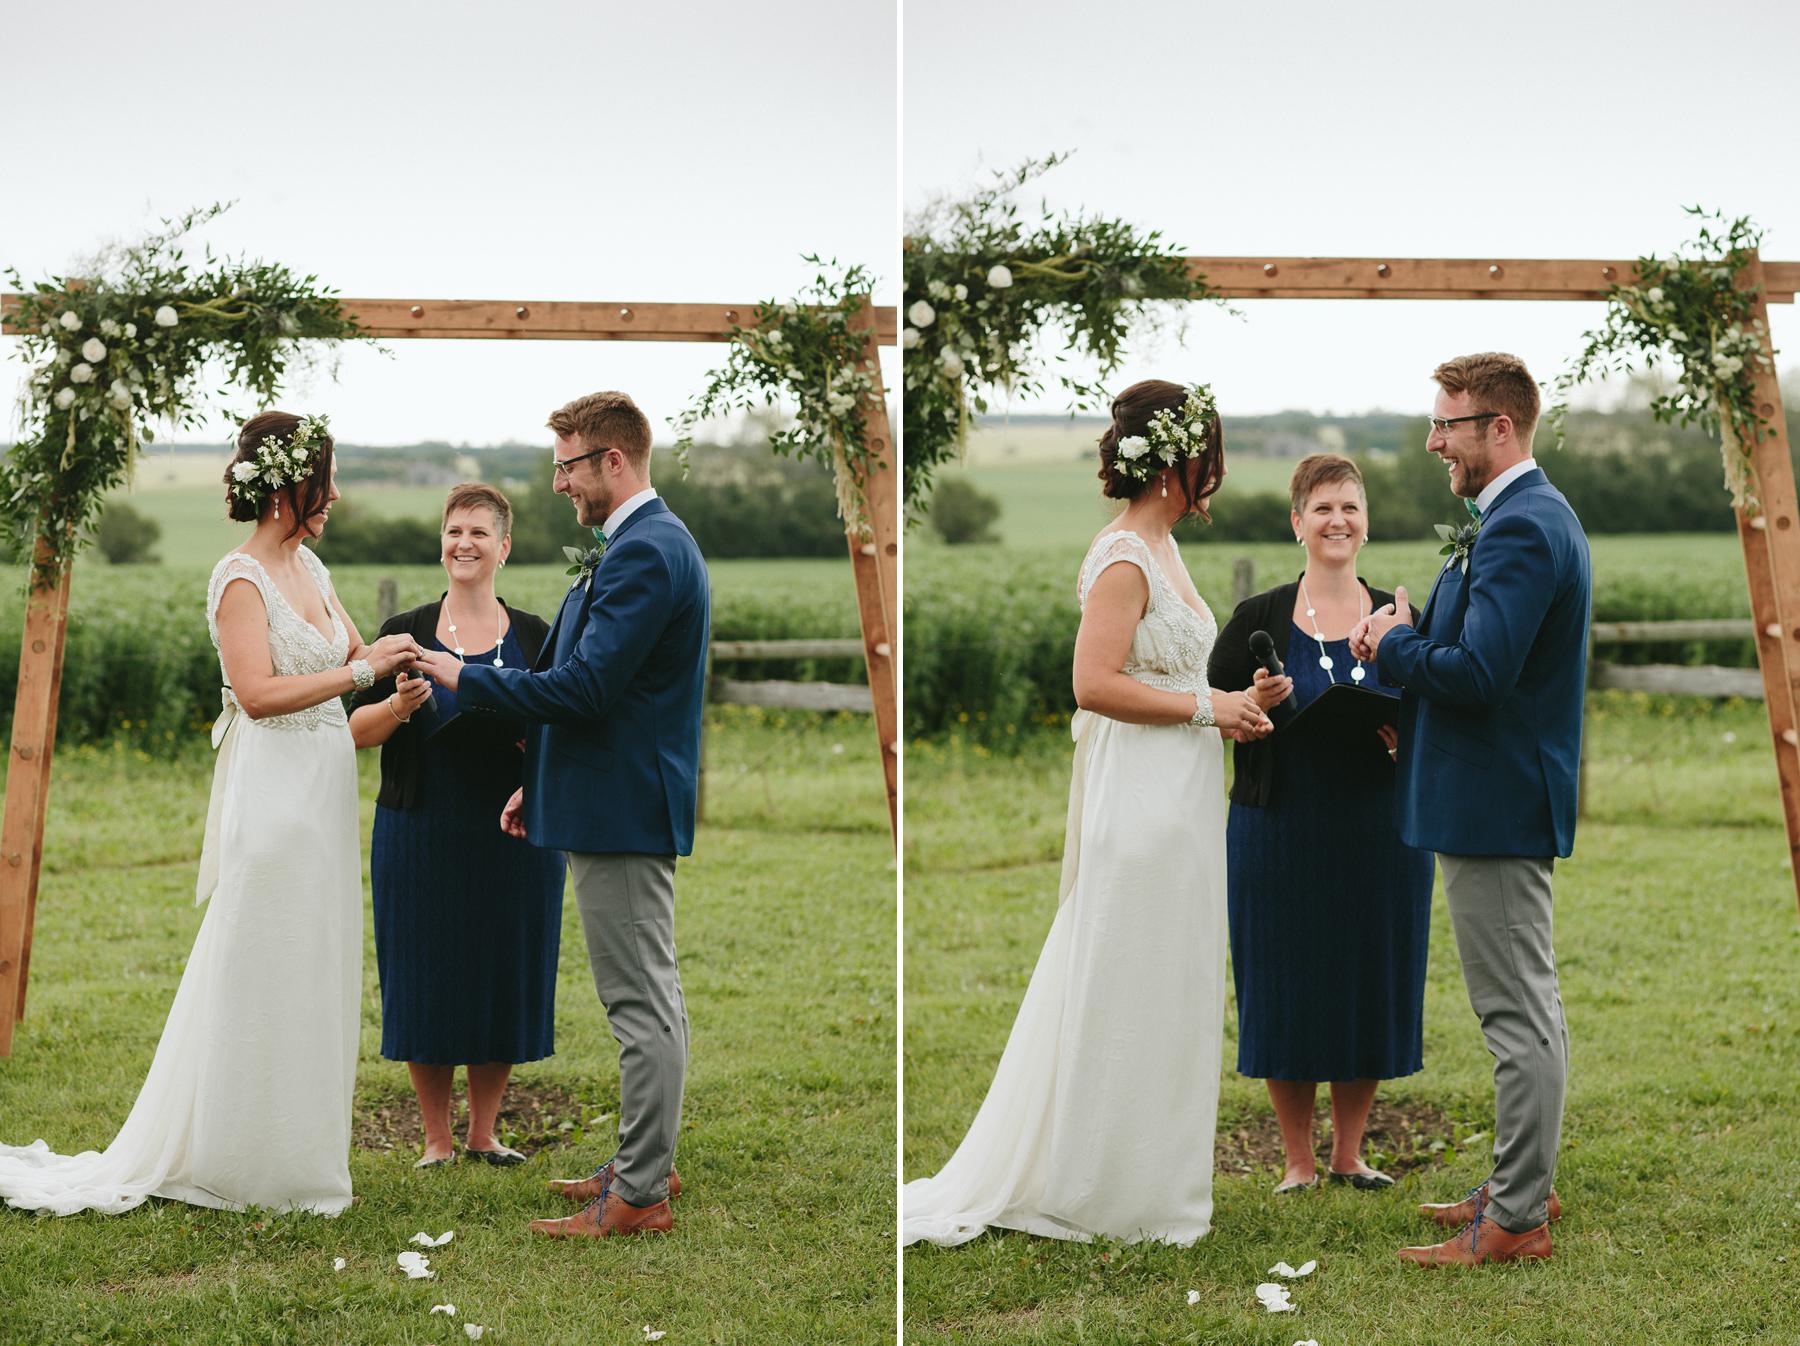 alberta-farm-wedding-photographer-rp-wj-139.jpg